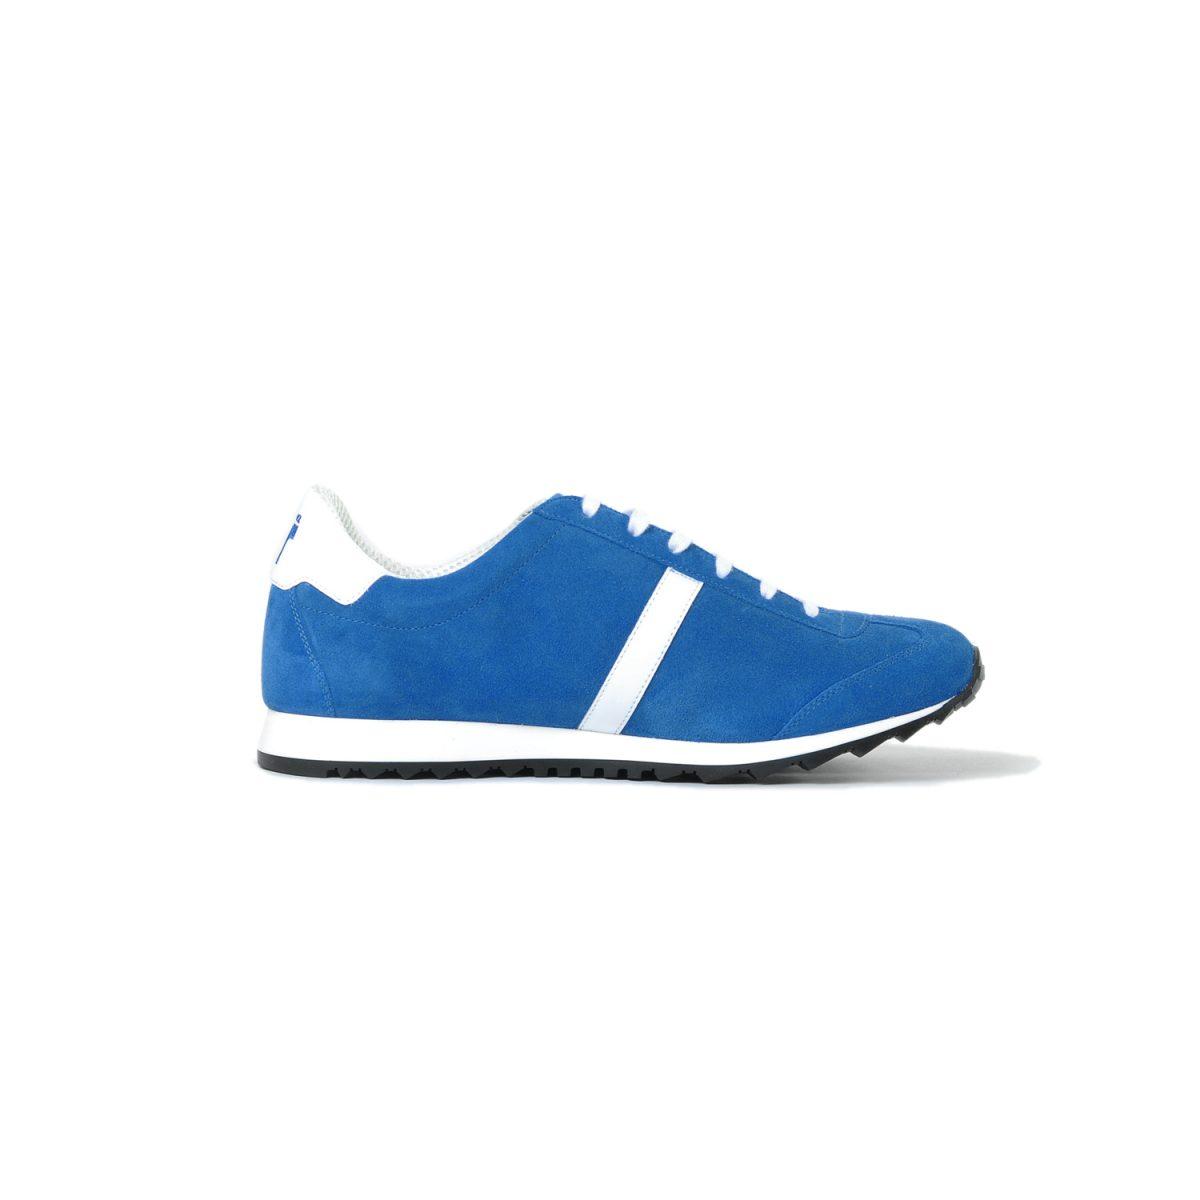 Tisza cipő - Martfű - Royal-fehér